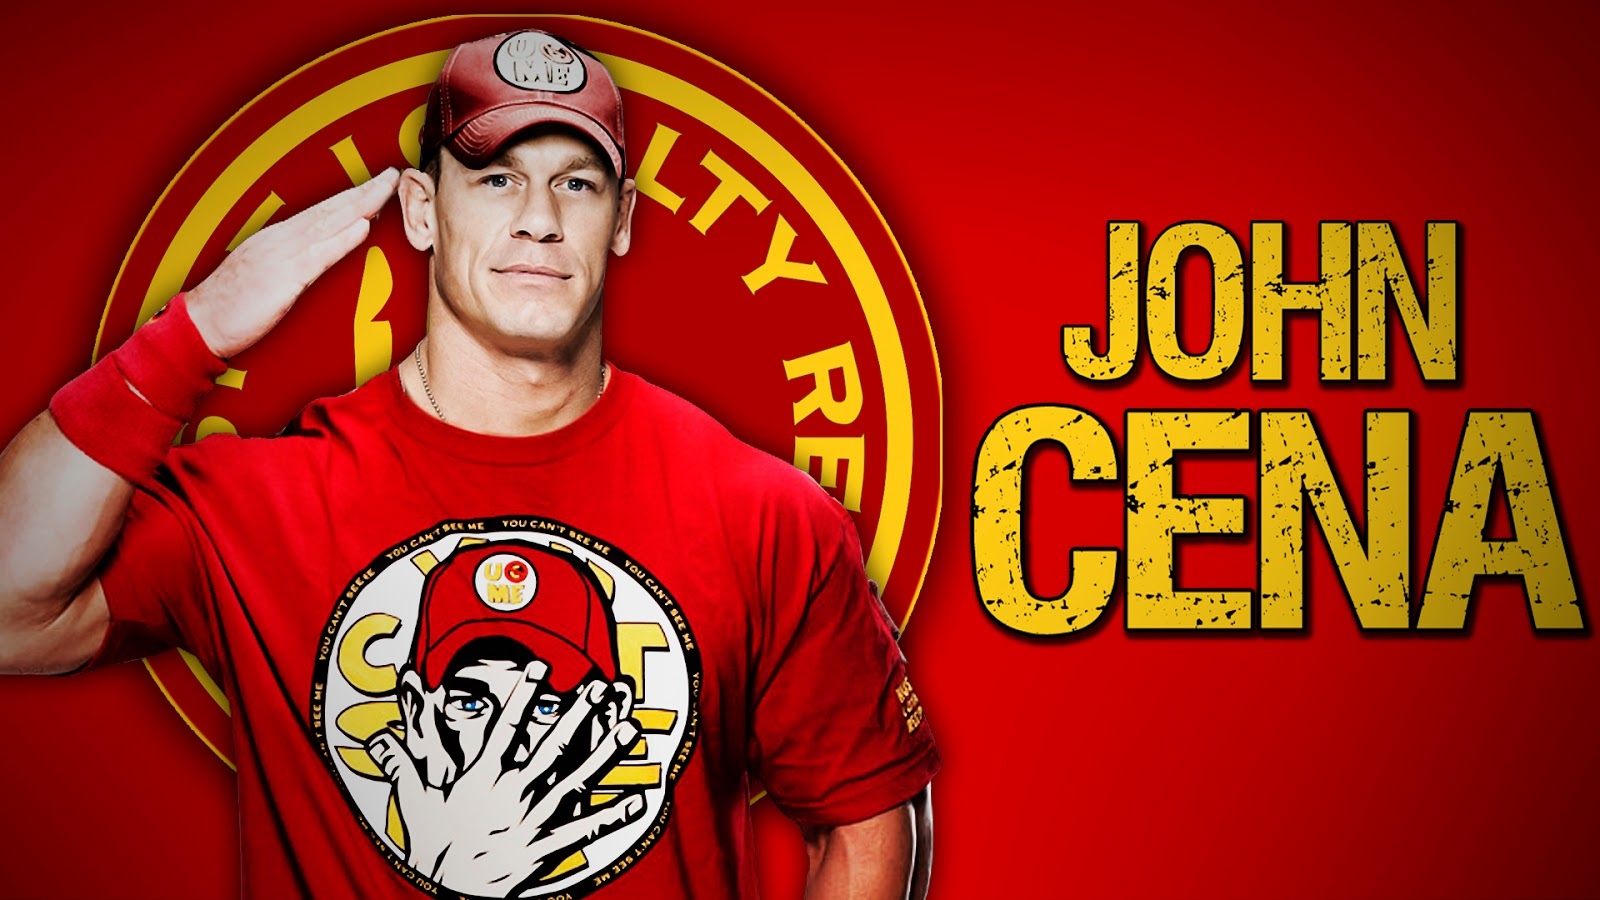 John Cena Wrestler 1920x1080 HD Wallpaper